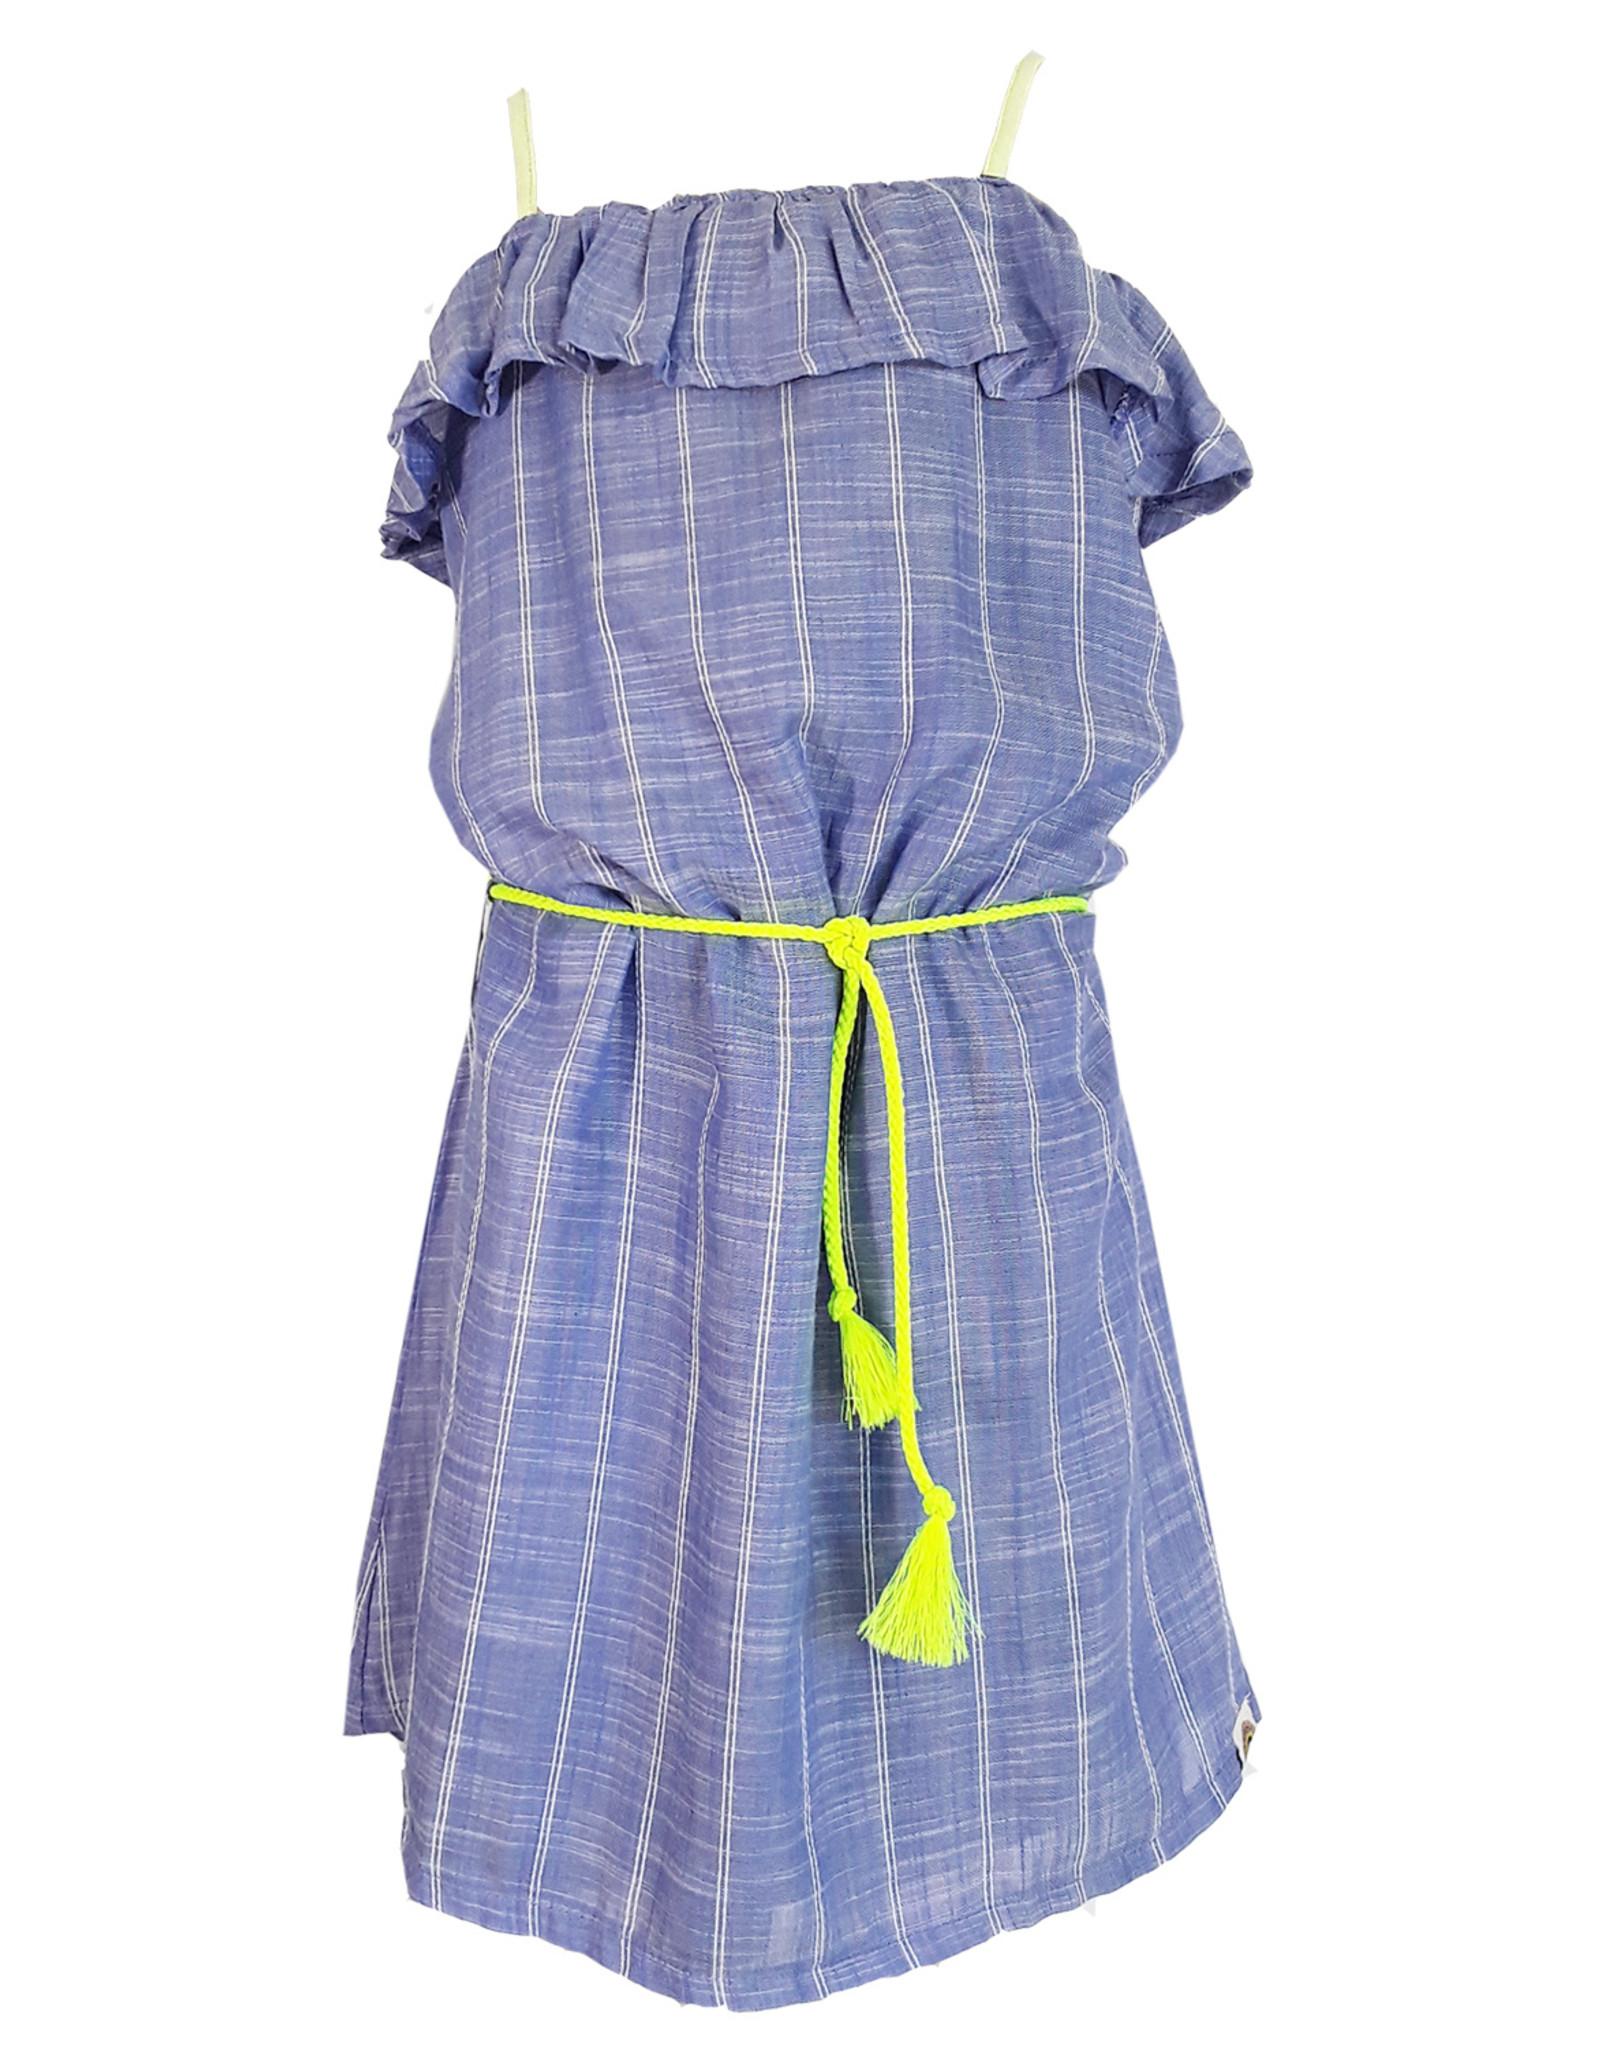 Topitm Dress Ursela Ice blue